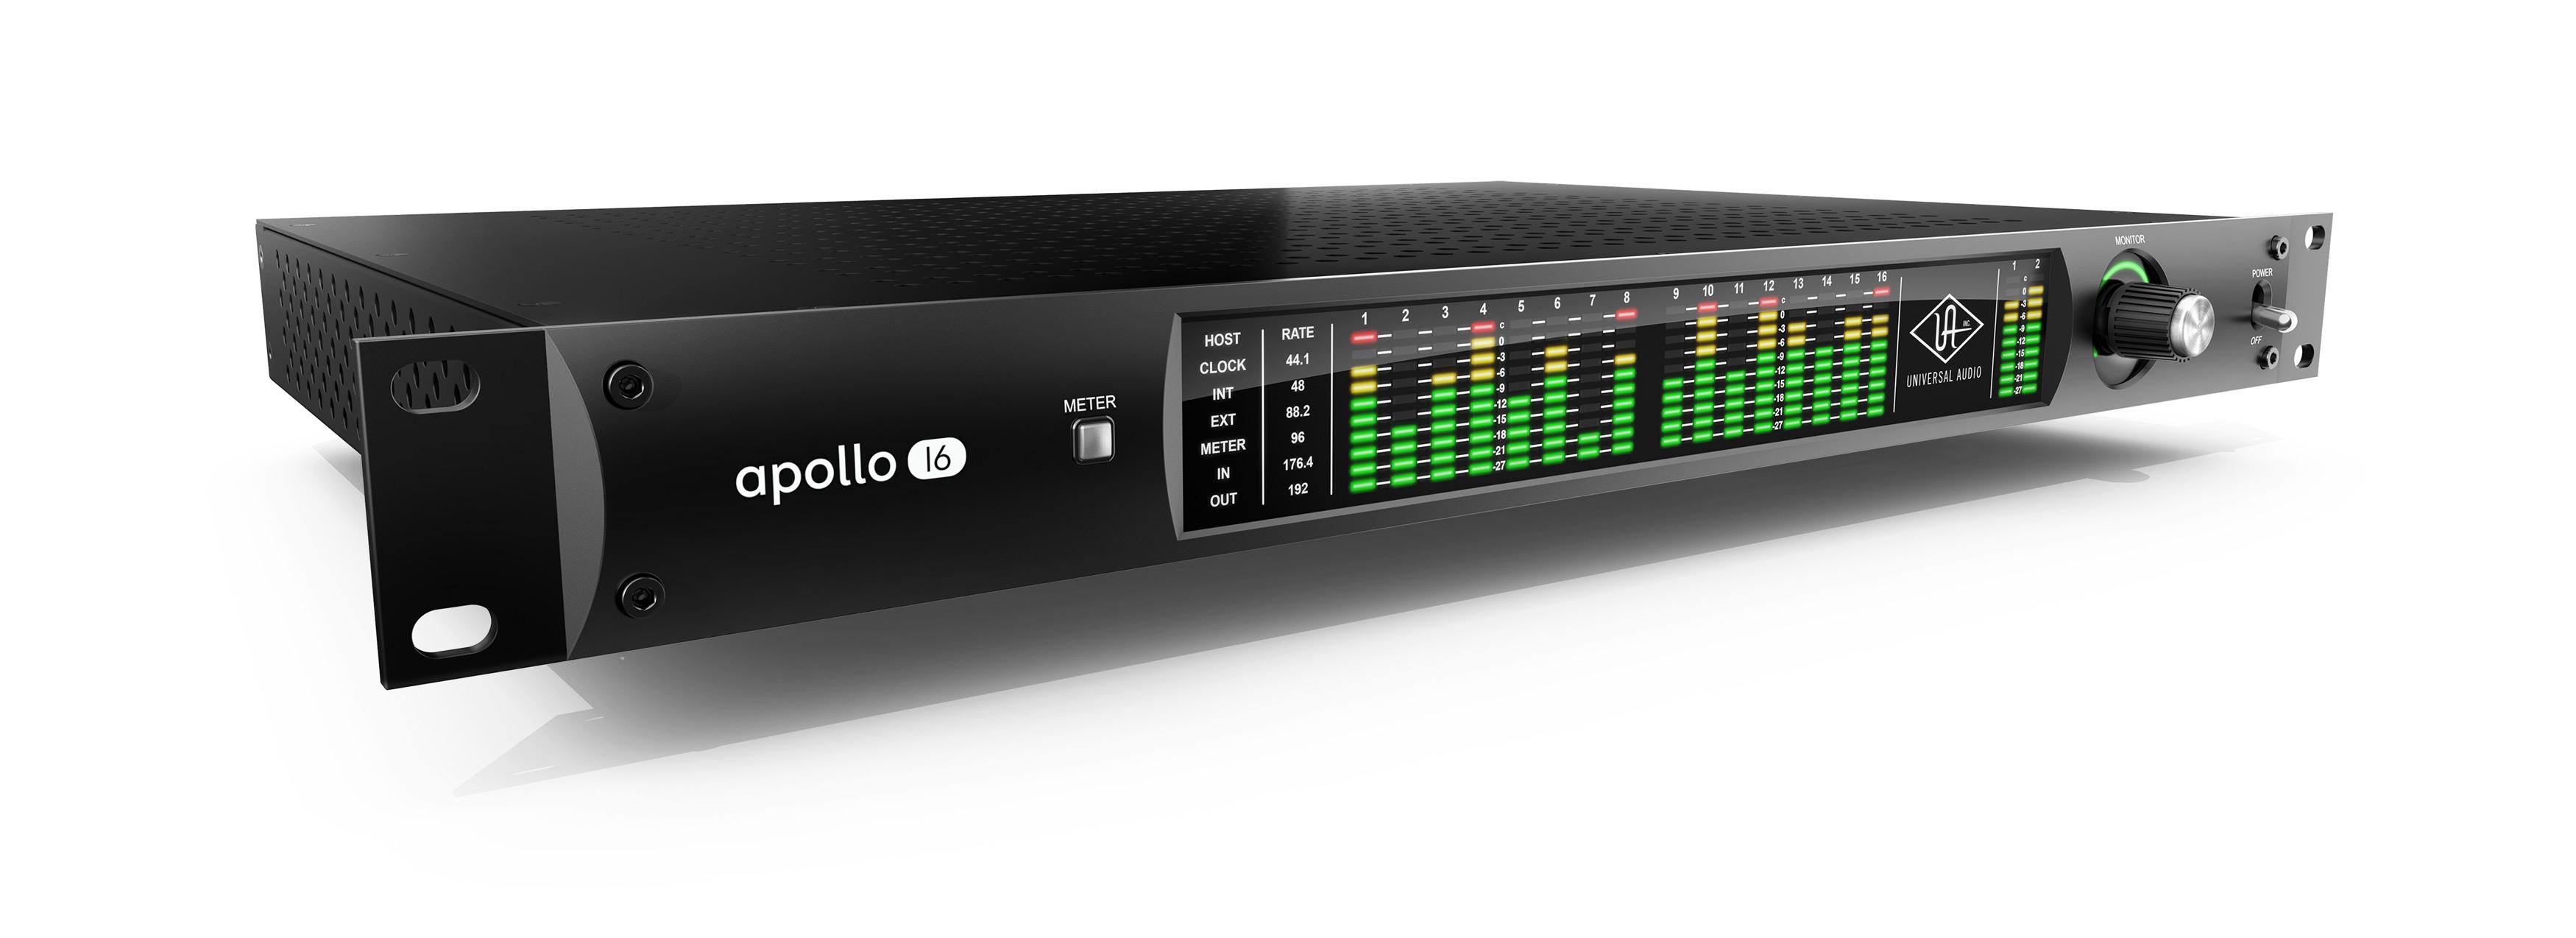 Universal Audio Apollo 16 Quad Pro Tools 12 Bundle   eBay